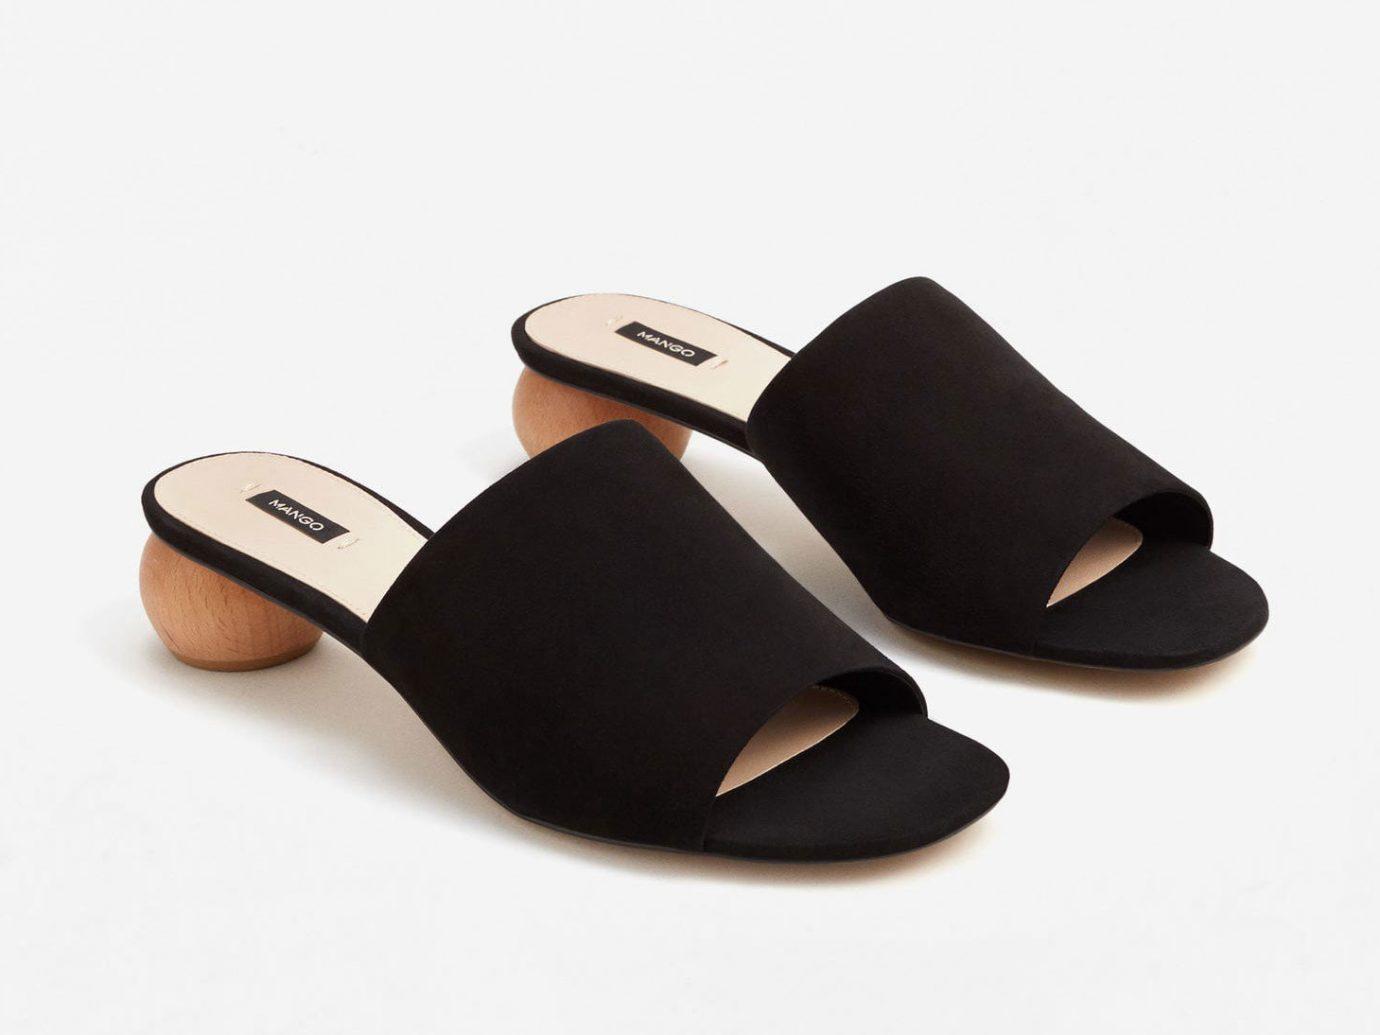 Style + Design footwear shoe black leg leather slipper arm brand outdoor shoe human body mouse